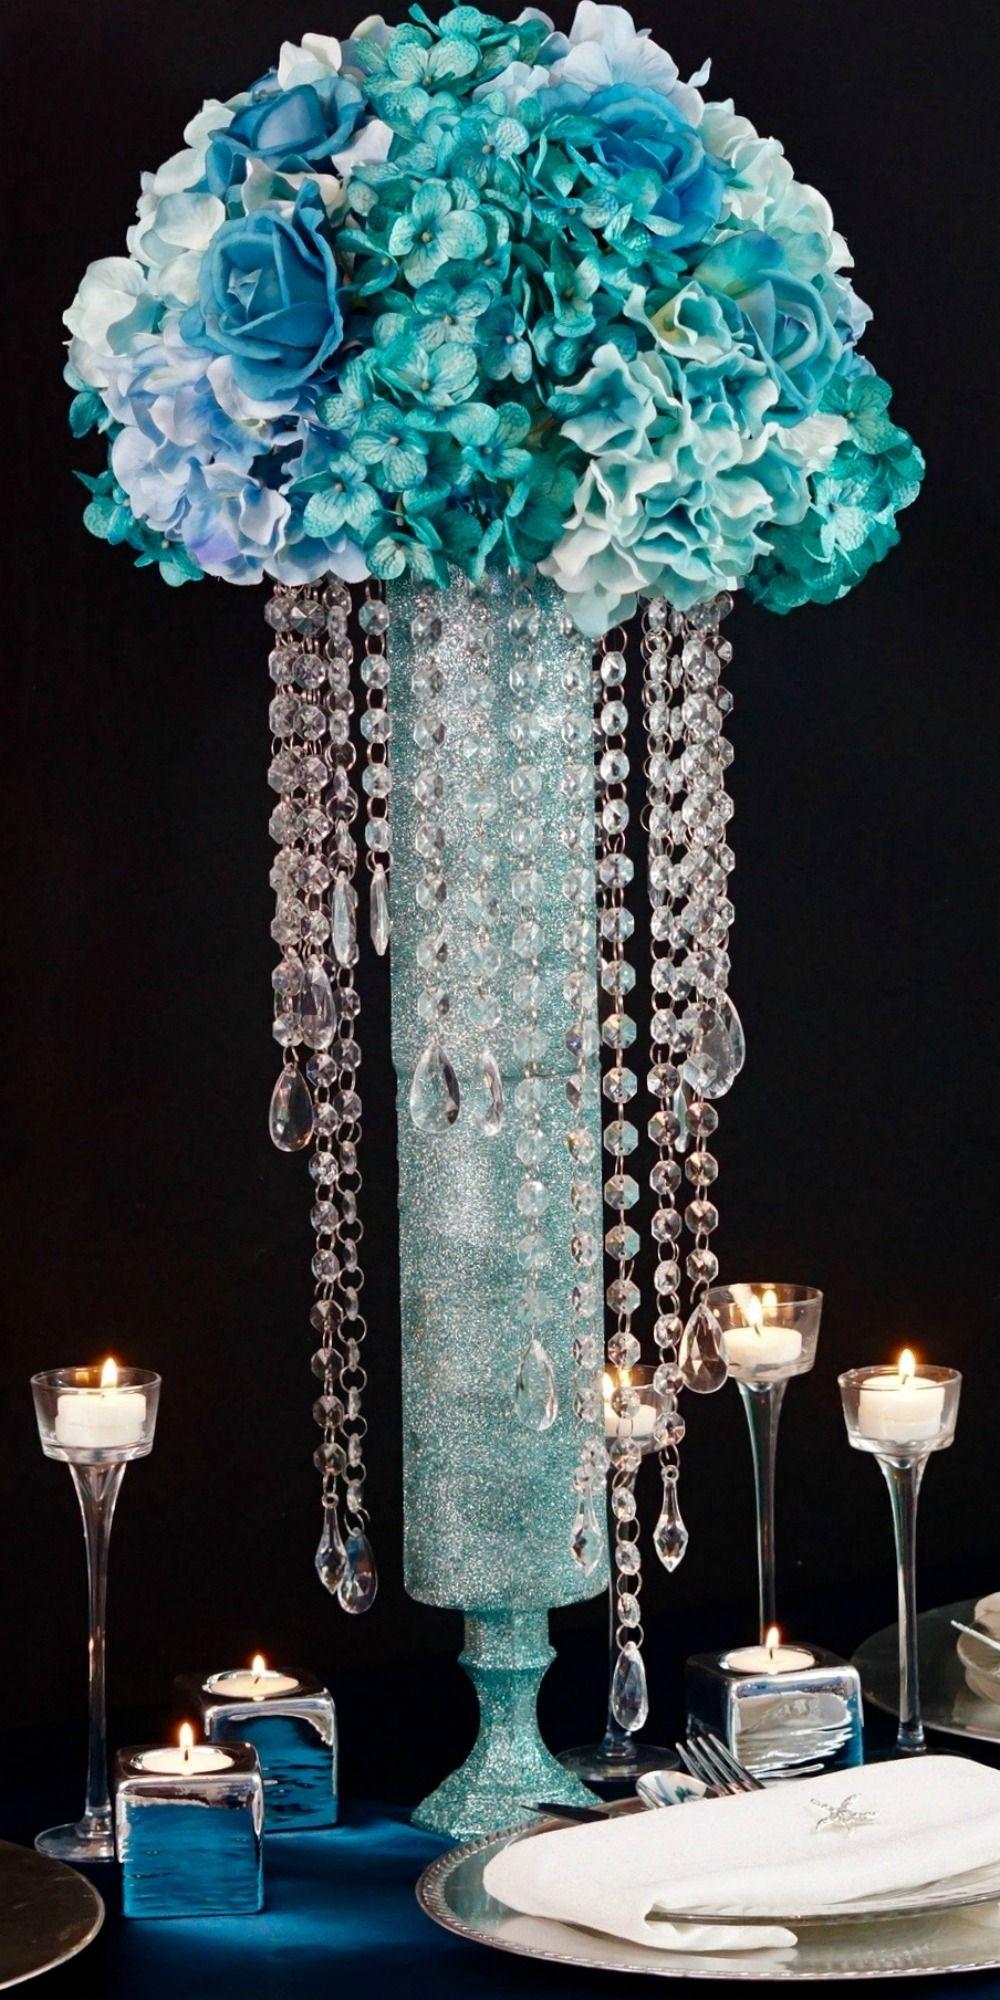 Blue DIY Wedding Centerpieces for Your Under the Sea Beach